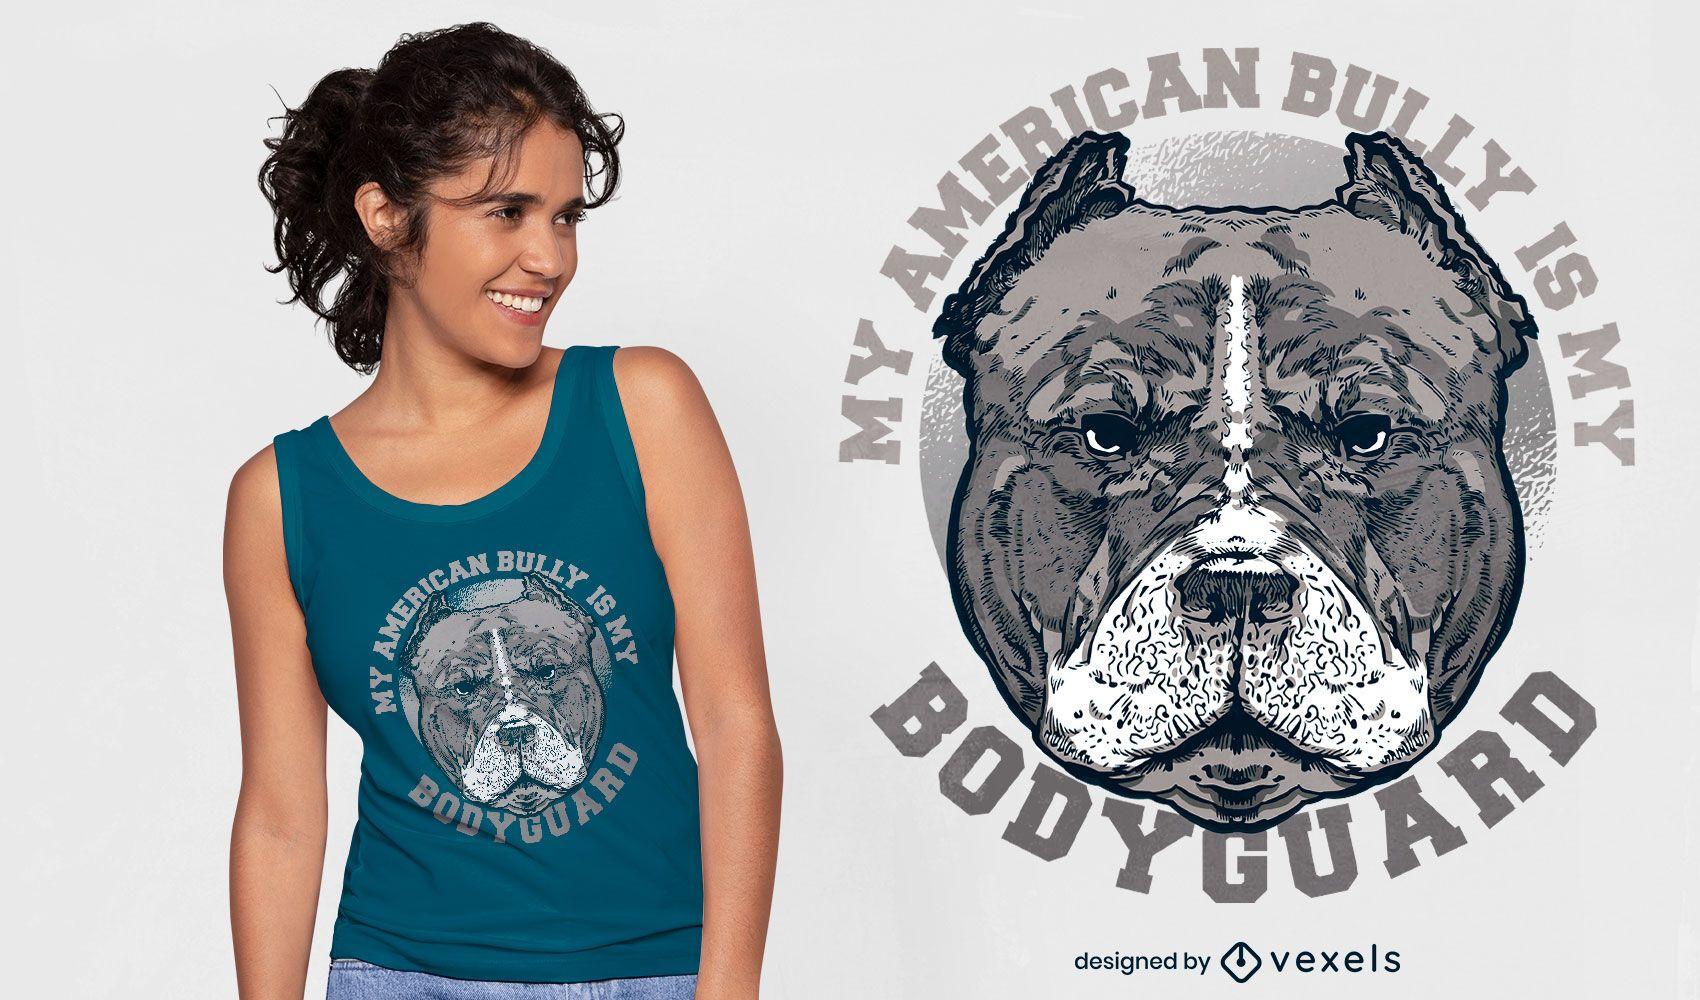 Pitbull dog bodyguard quote t-shirt design